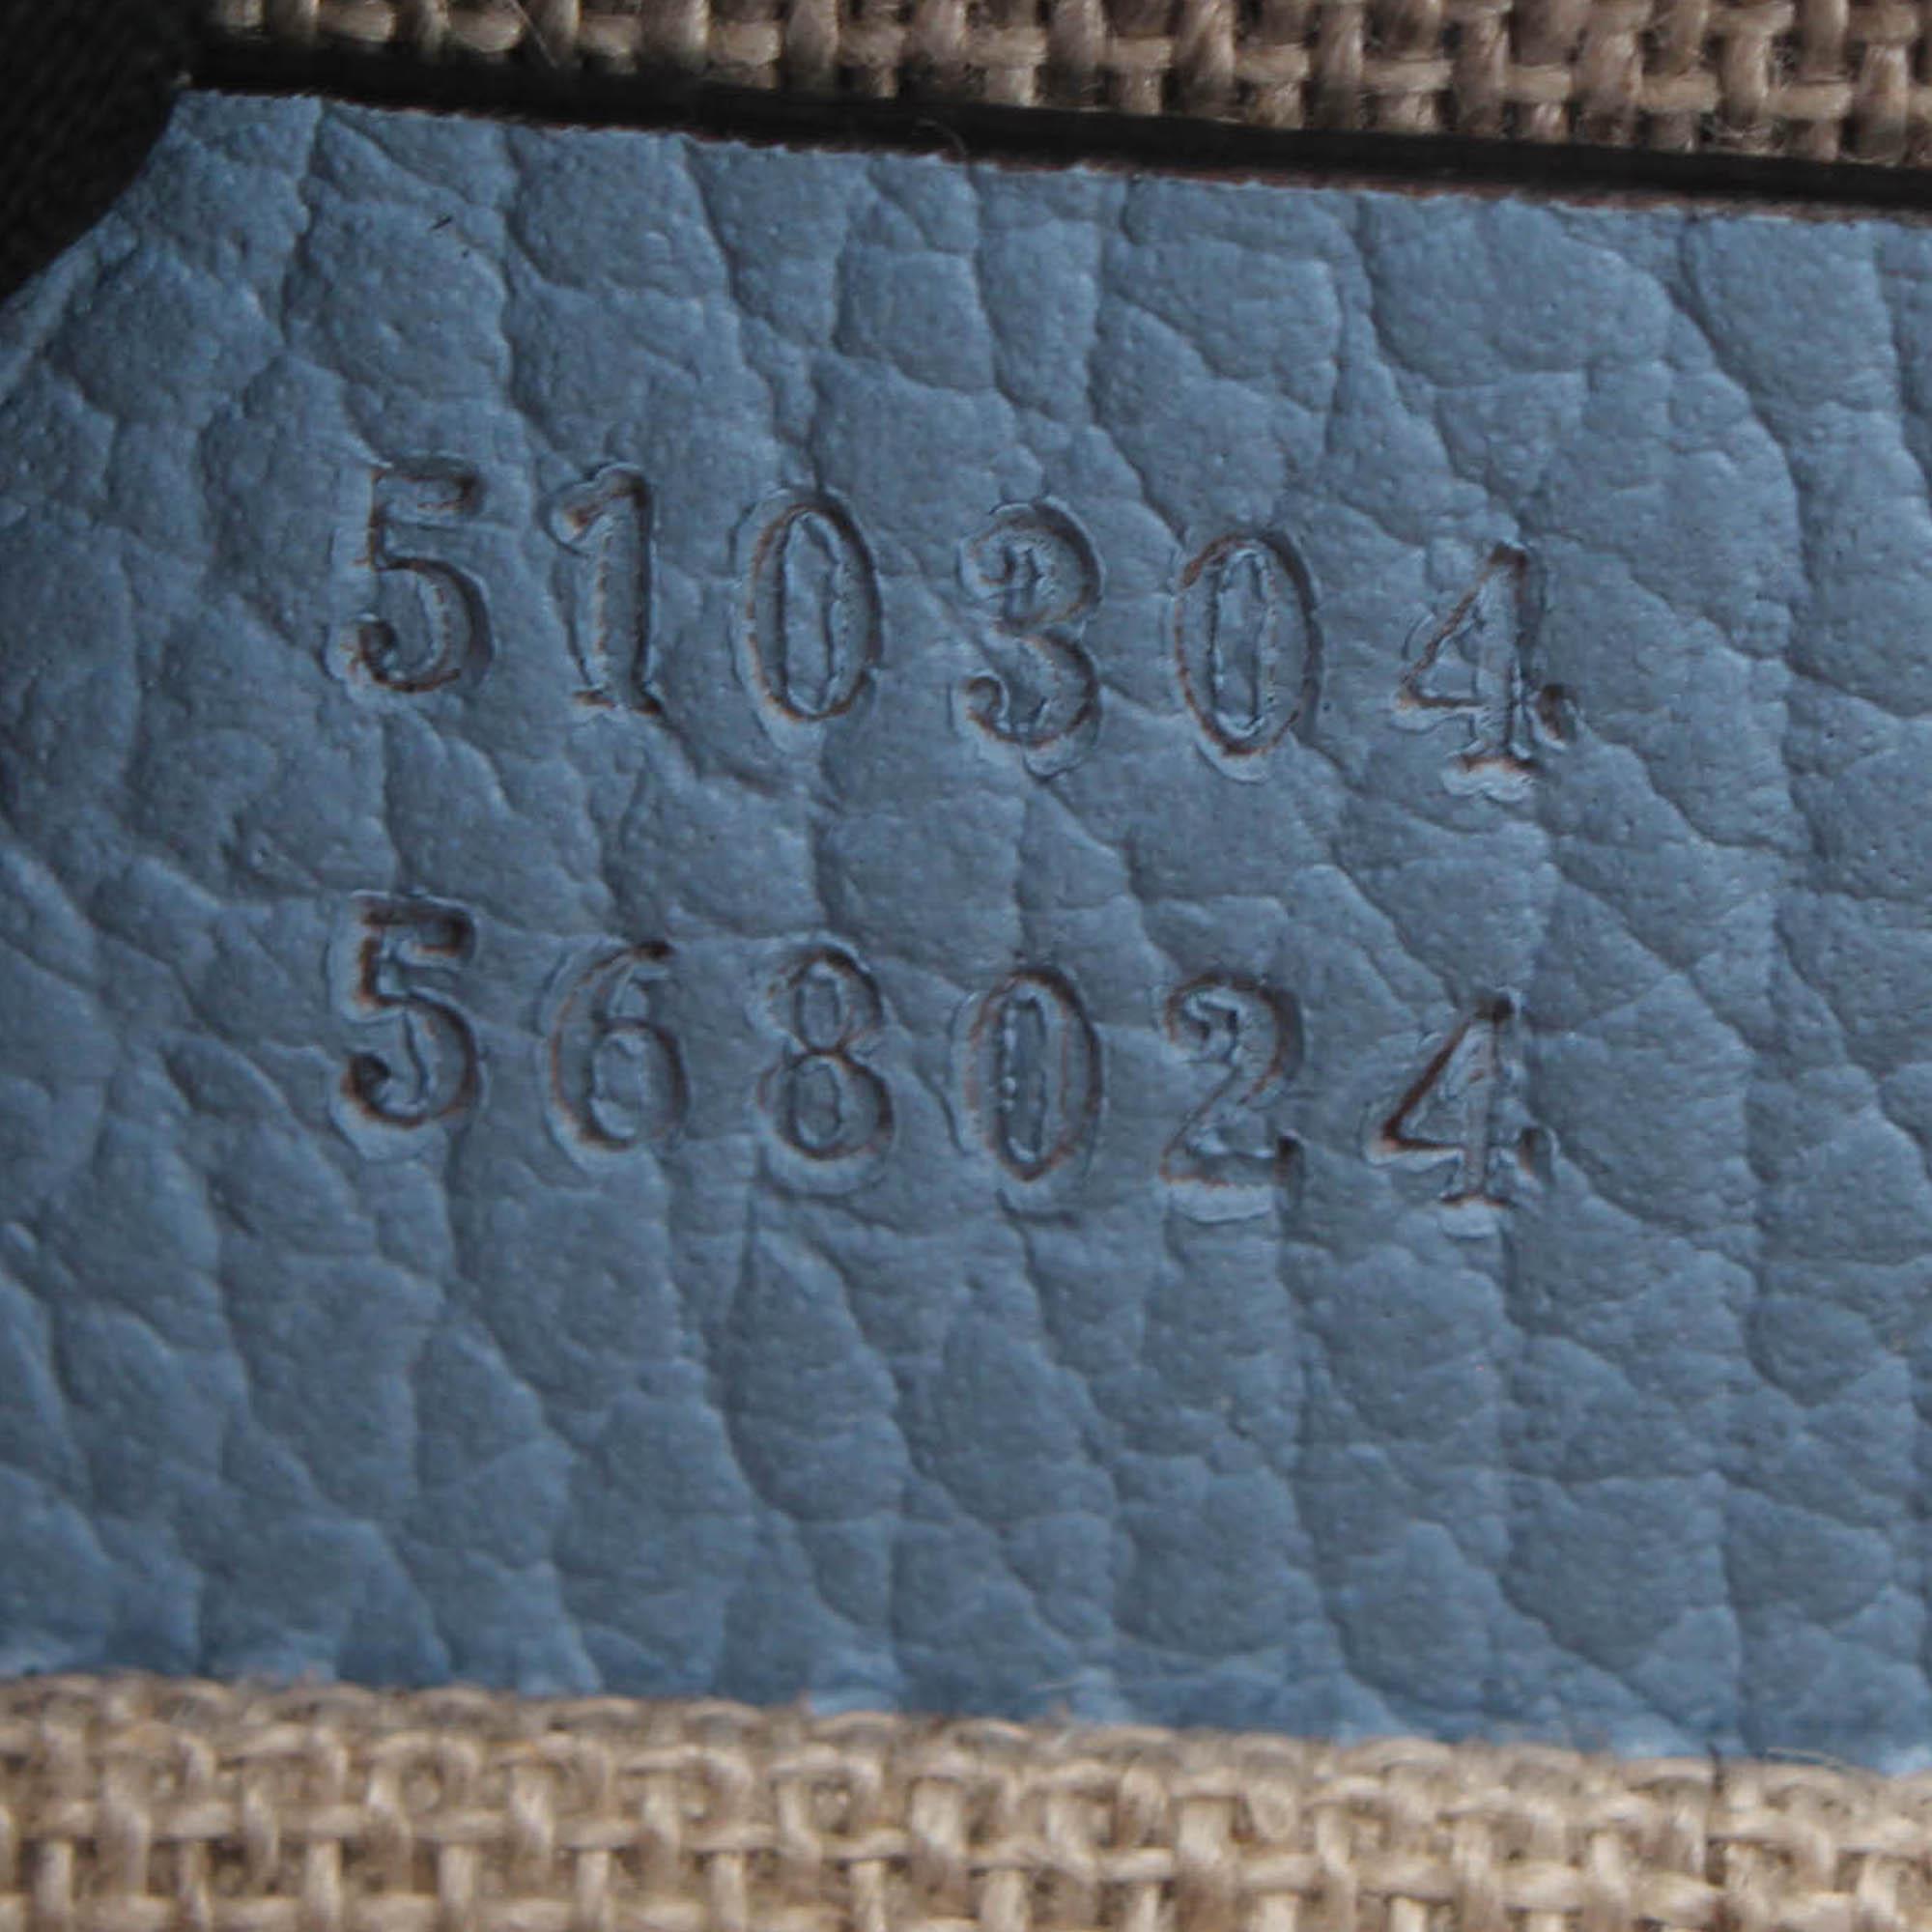 Gucci Interlocking G Leather Crossbody Bag